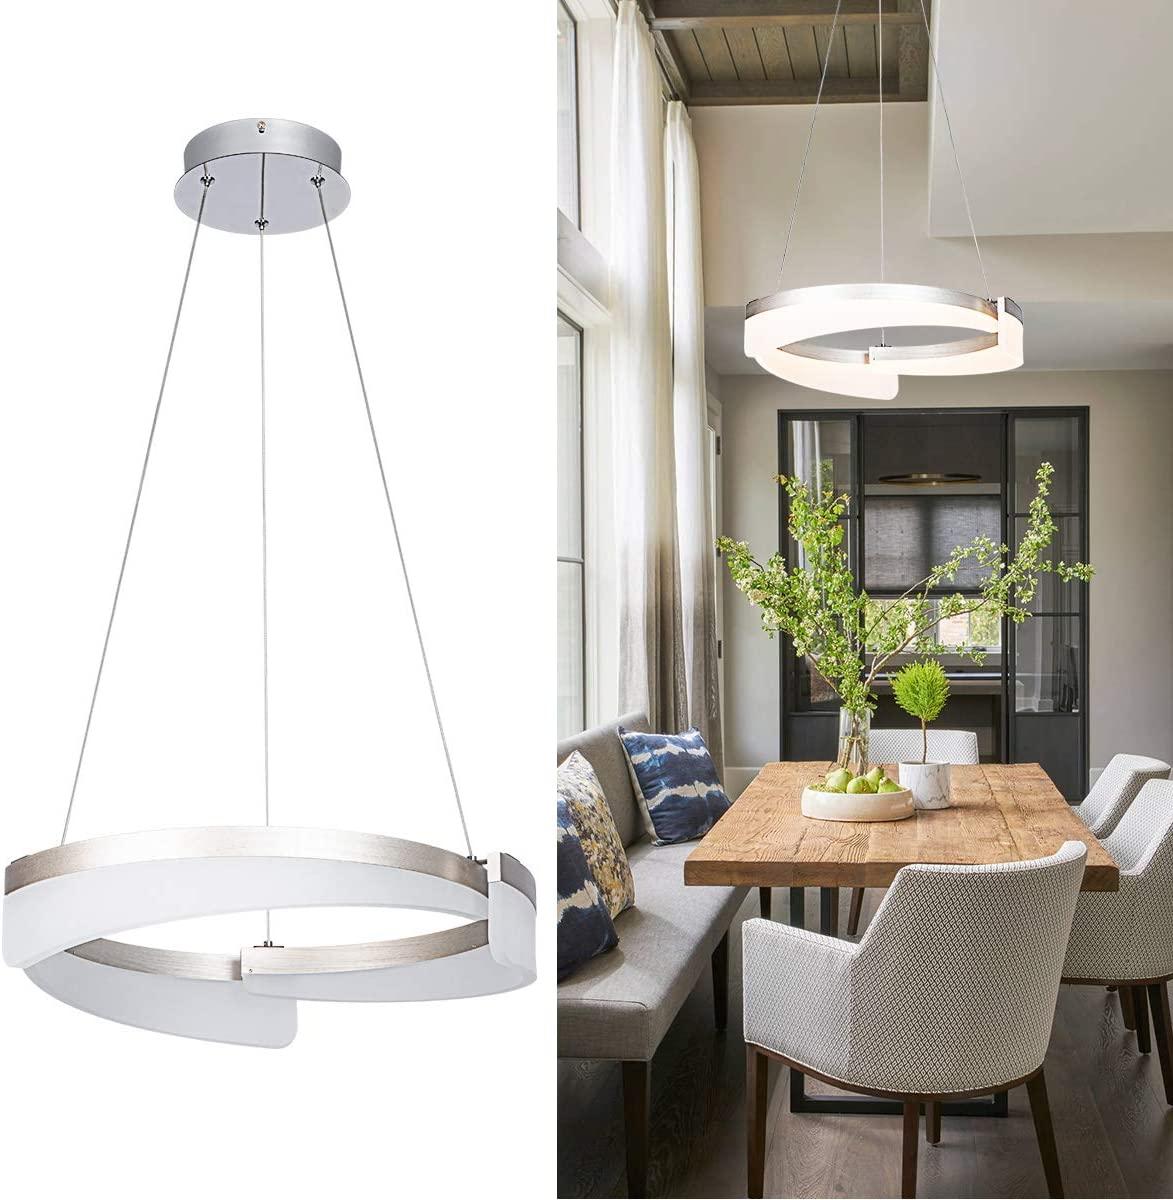 LED Pendant Light Not Dimmable Adjustable 1 Ring Acrylic Modern Chandelier for Living Room Bedroom Dining Room, Warm White 3000K, Chrome, by HL